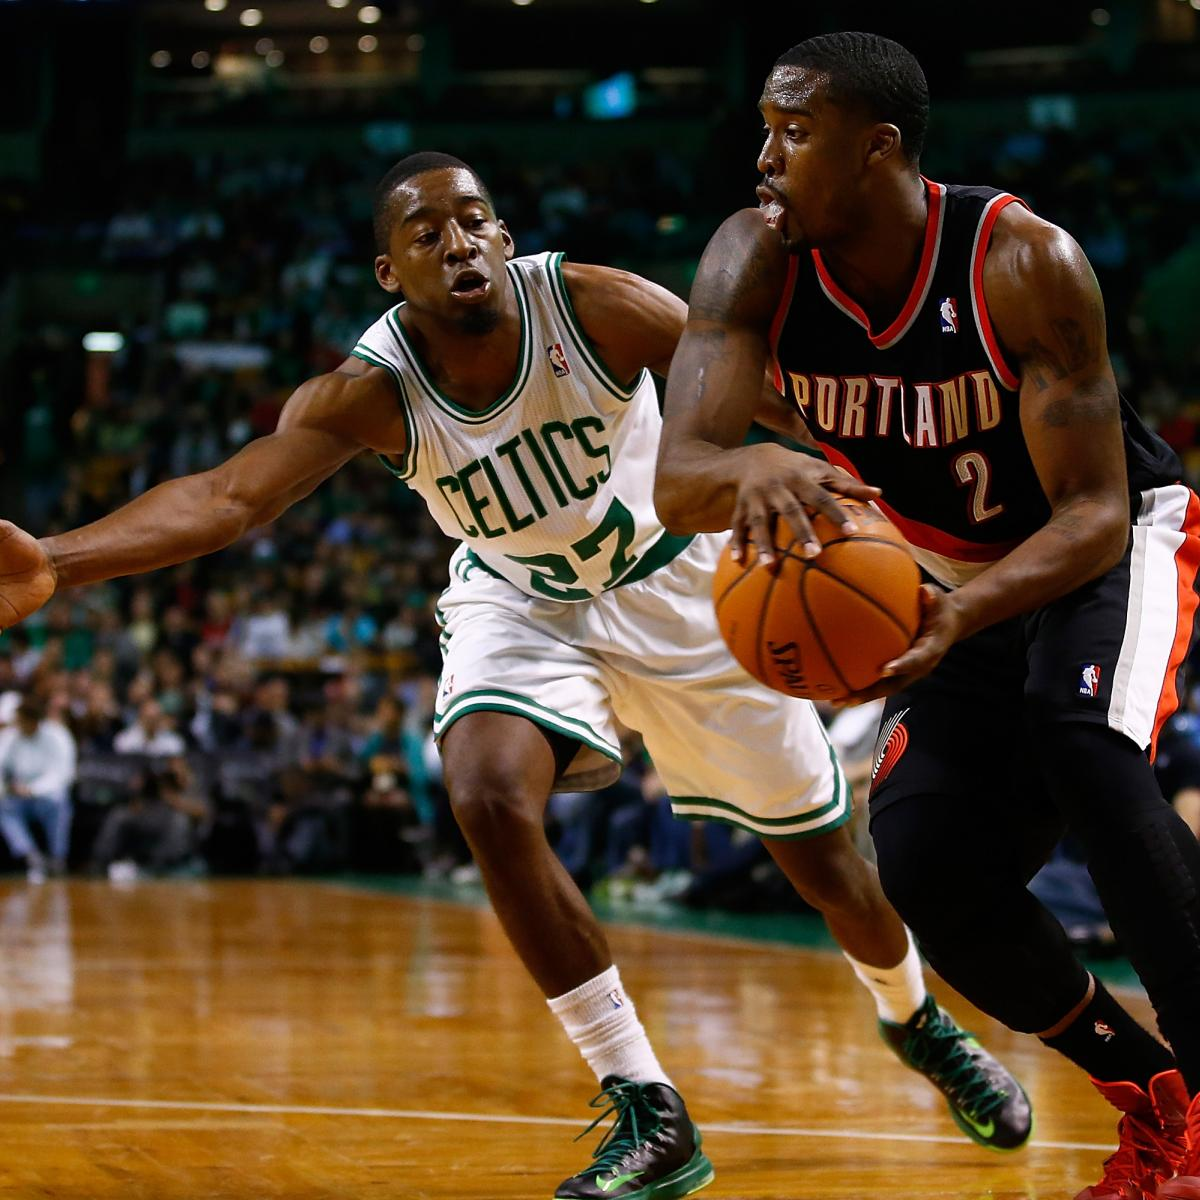 Portland Trail Blazers Roster 2014: Boston Celtics Vs. Portland Trail Blazers: Live Score And